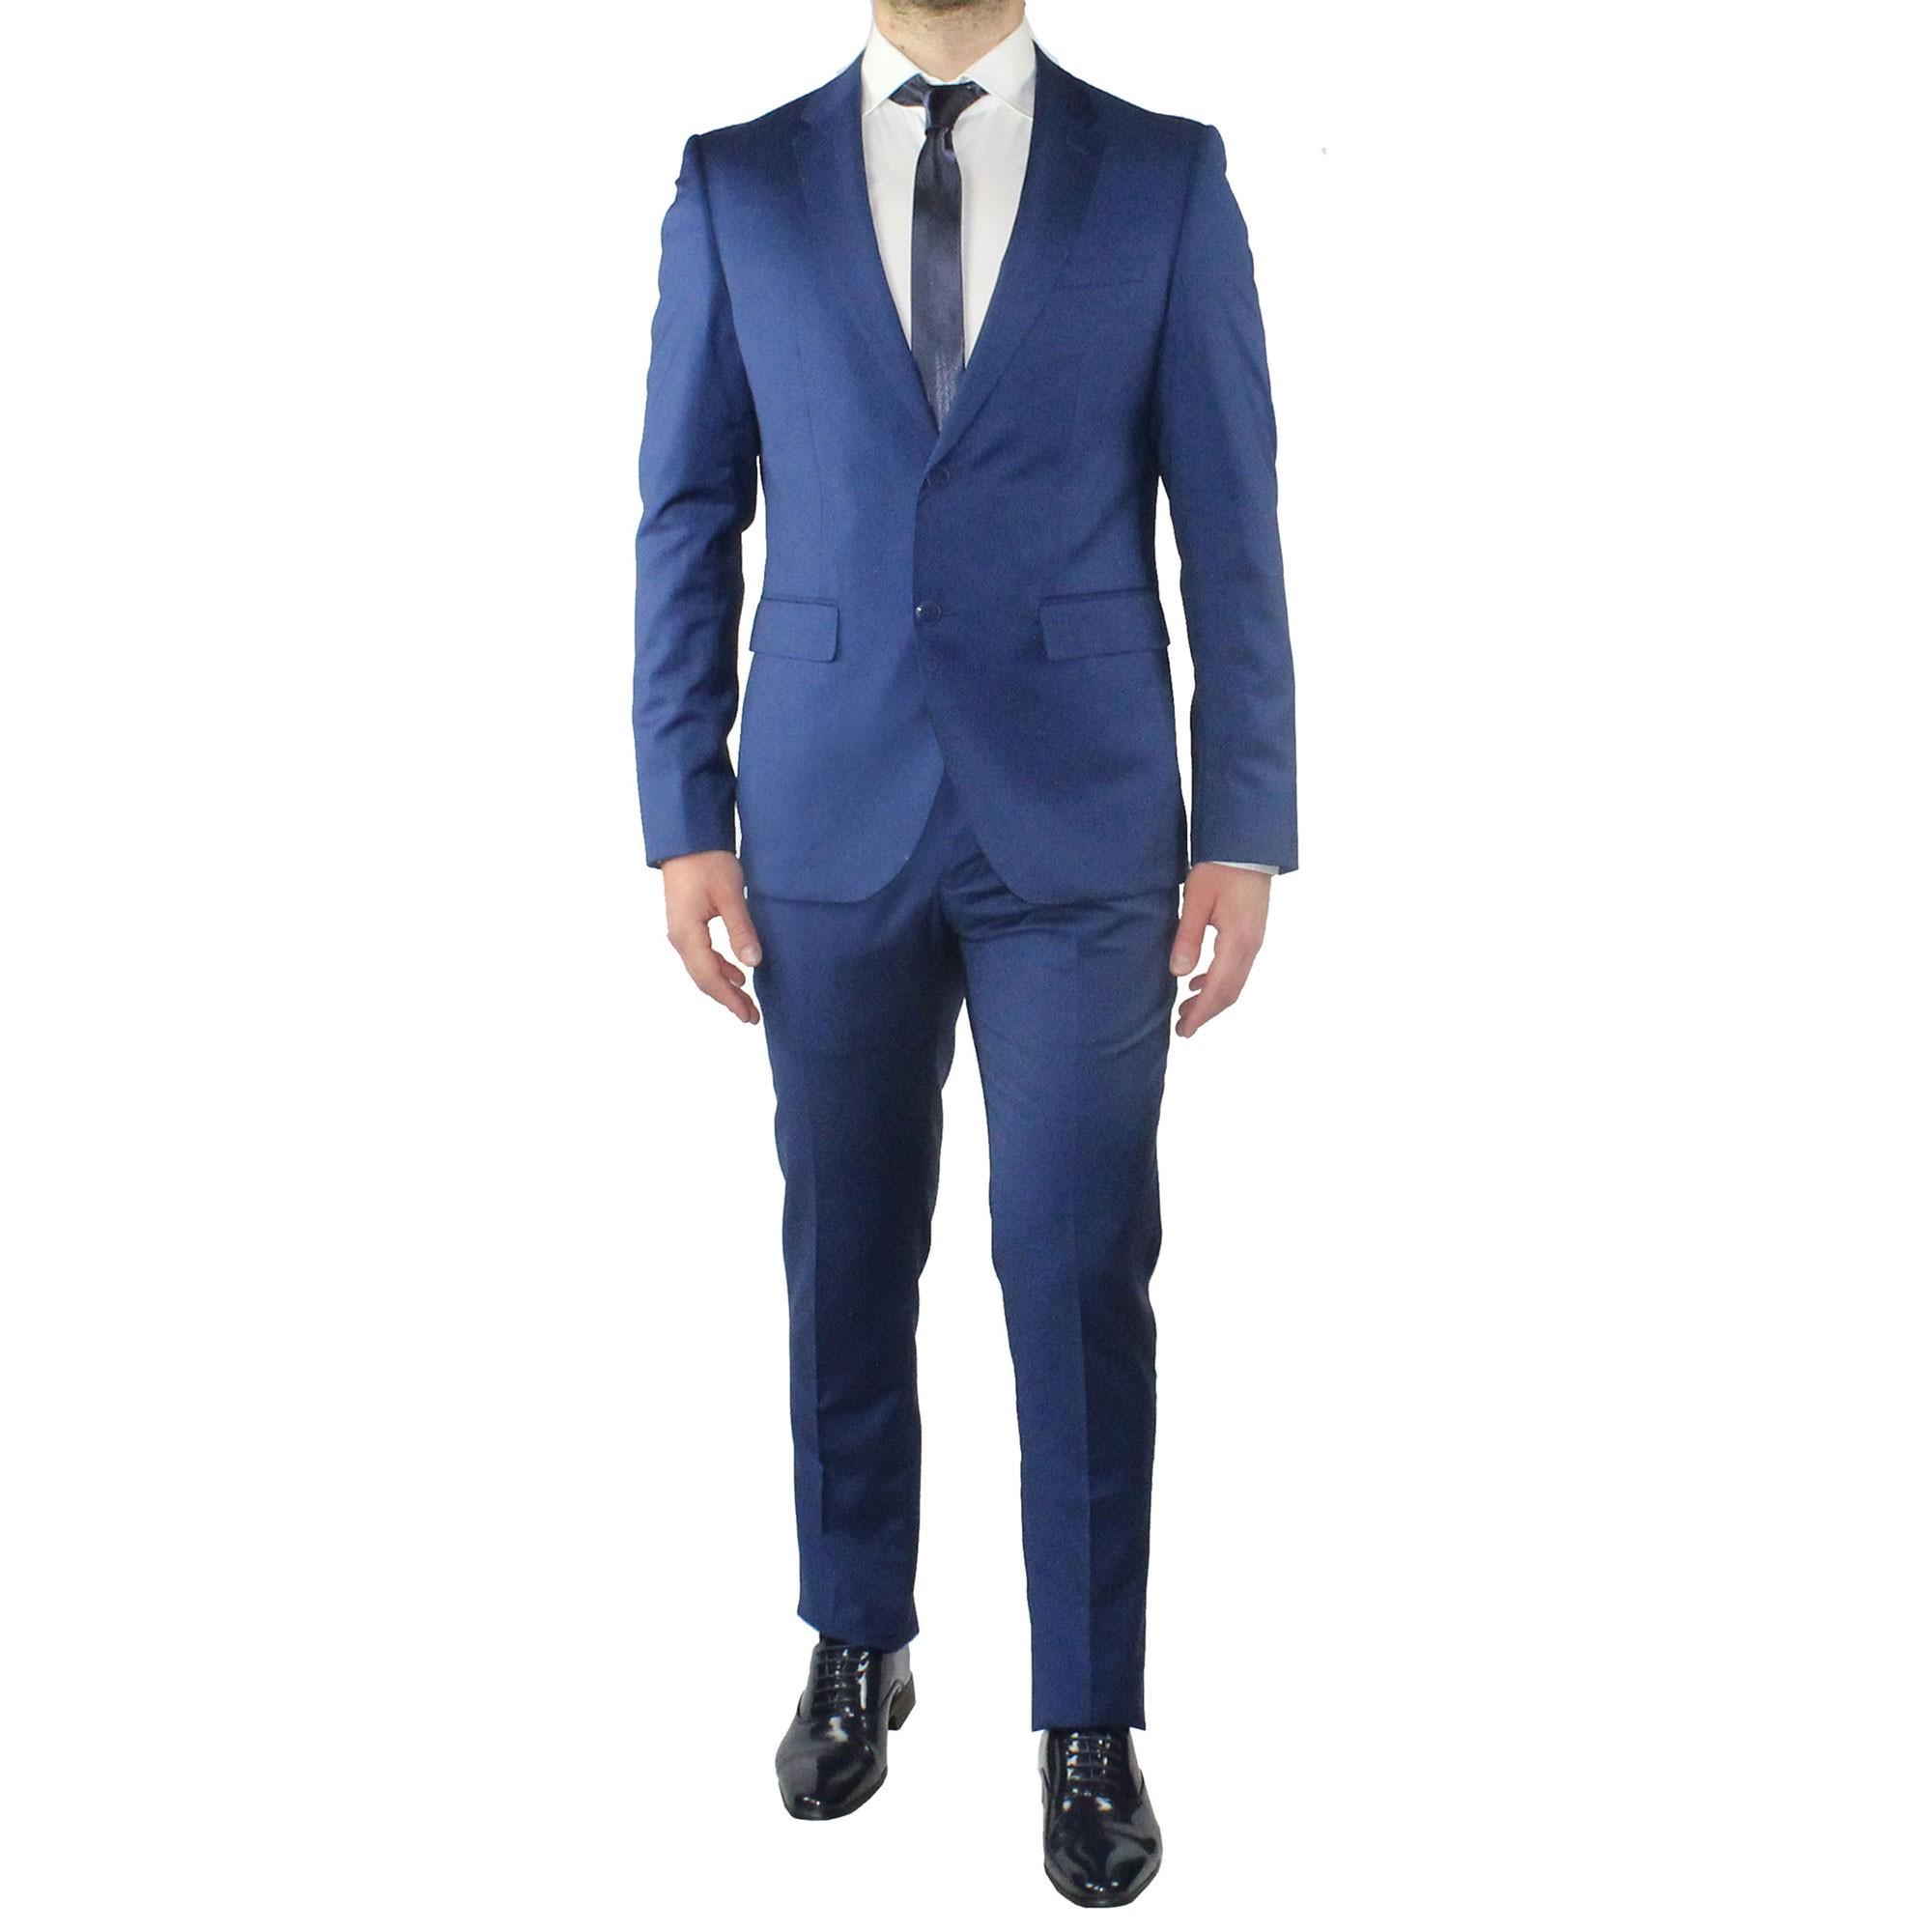 Vestiti Eleganti Uomo.Abito Uomo Elegante Blu Vestito Completo Estivo Cerimonia